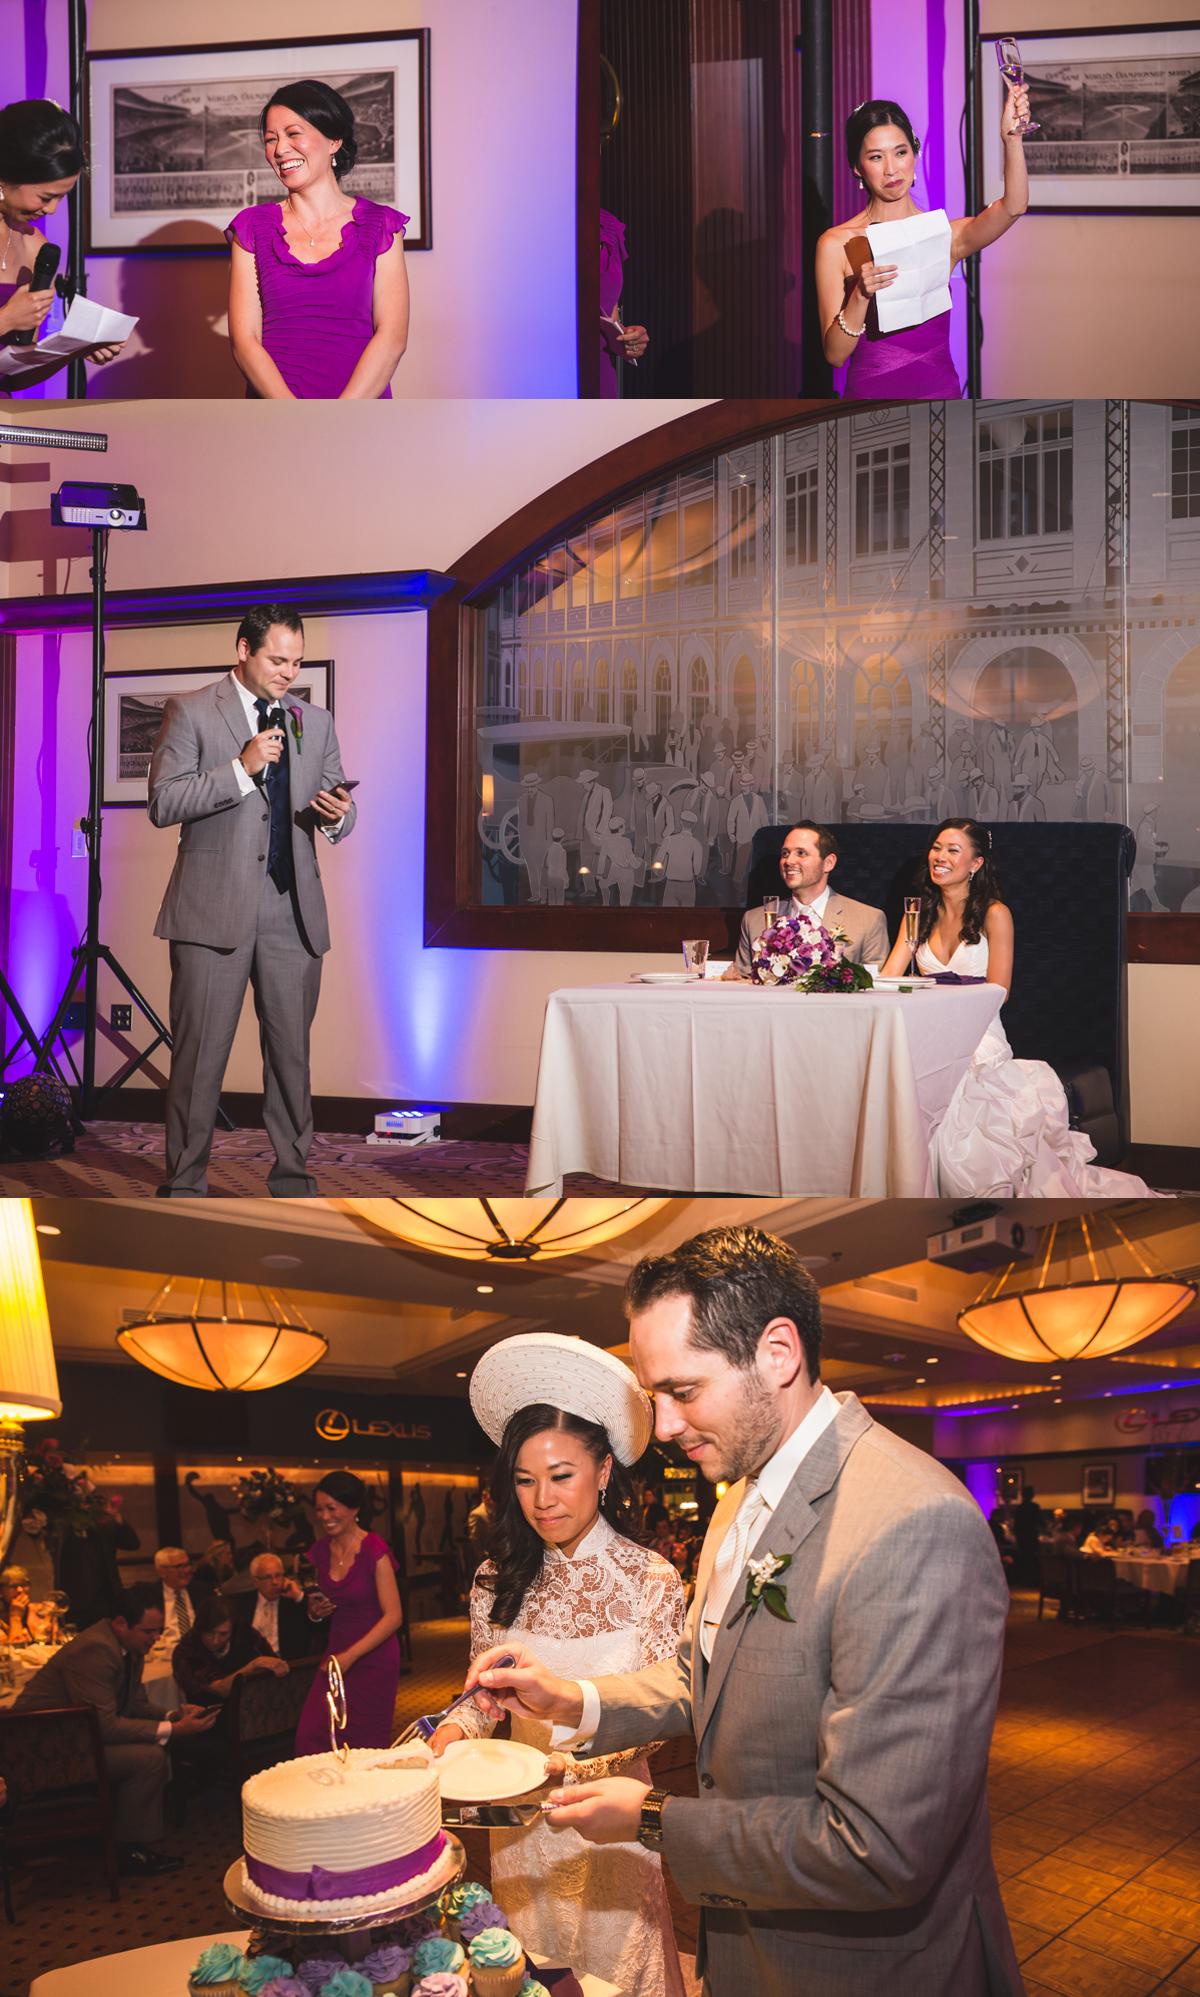 pittsburgh-wedding-photographer-kimly-james-heinz-chapel-pnc-lexus-club-tea-ceremony-18